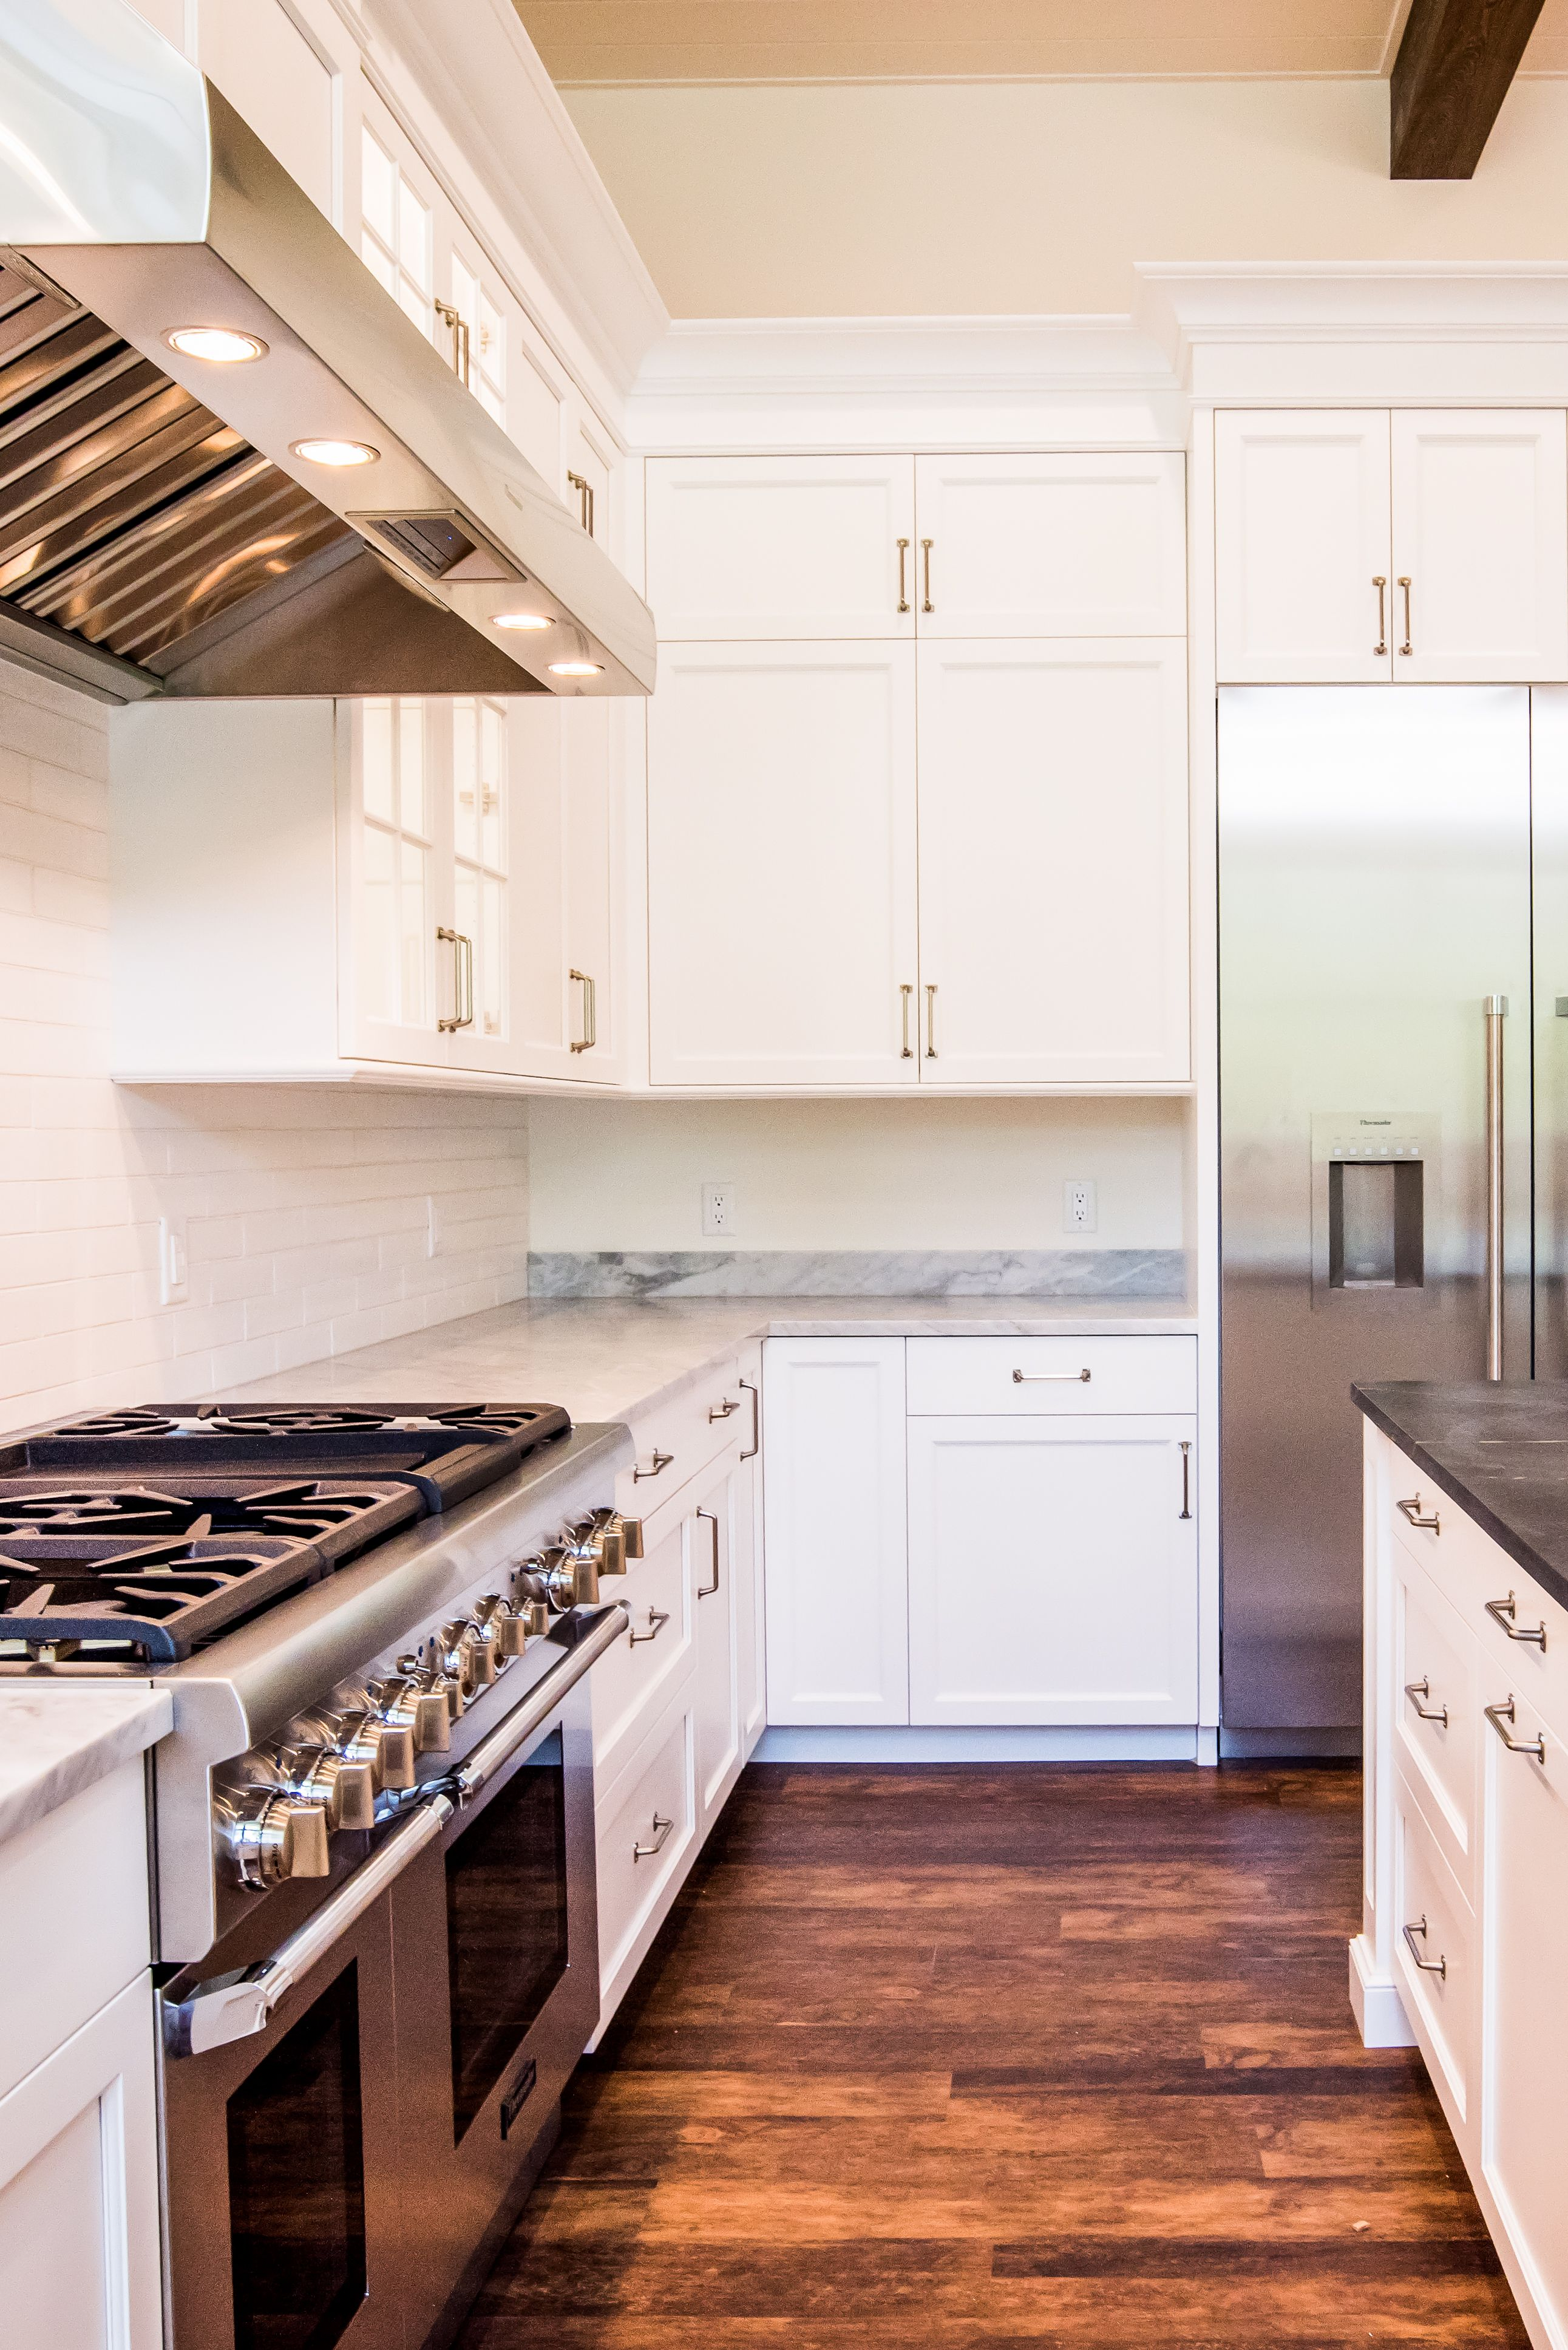 Farmhouse Kitchen Kitchendesign Countertops Cabinets Customkitchen Customcabinets Soapstone Cabinetry Design Cabinetry Design